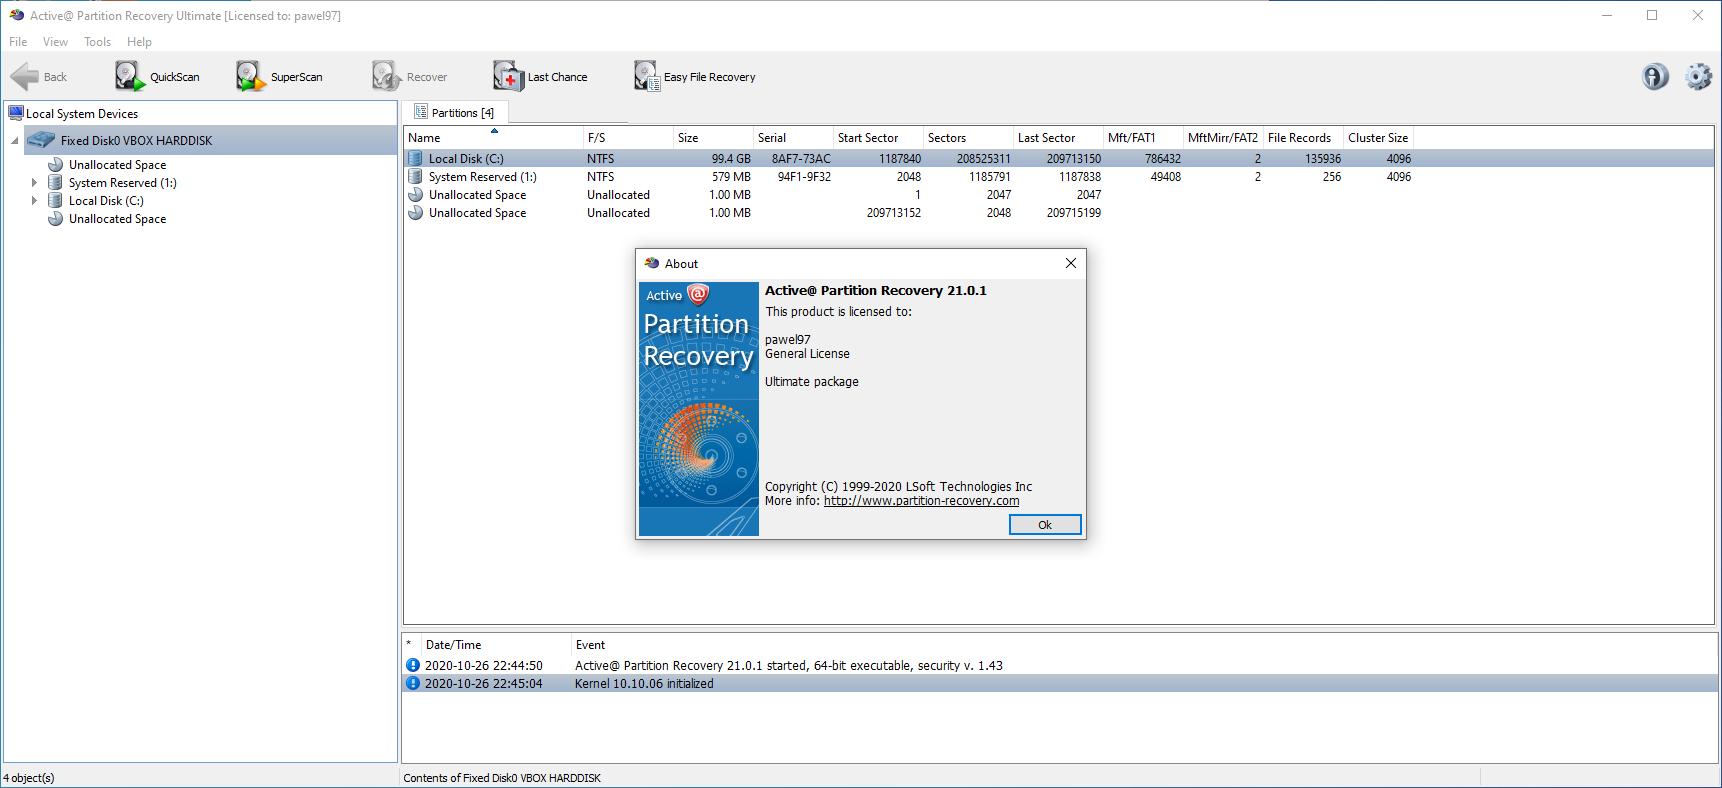 activepr21.0.1